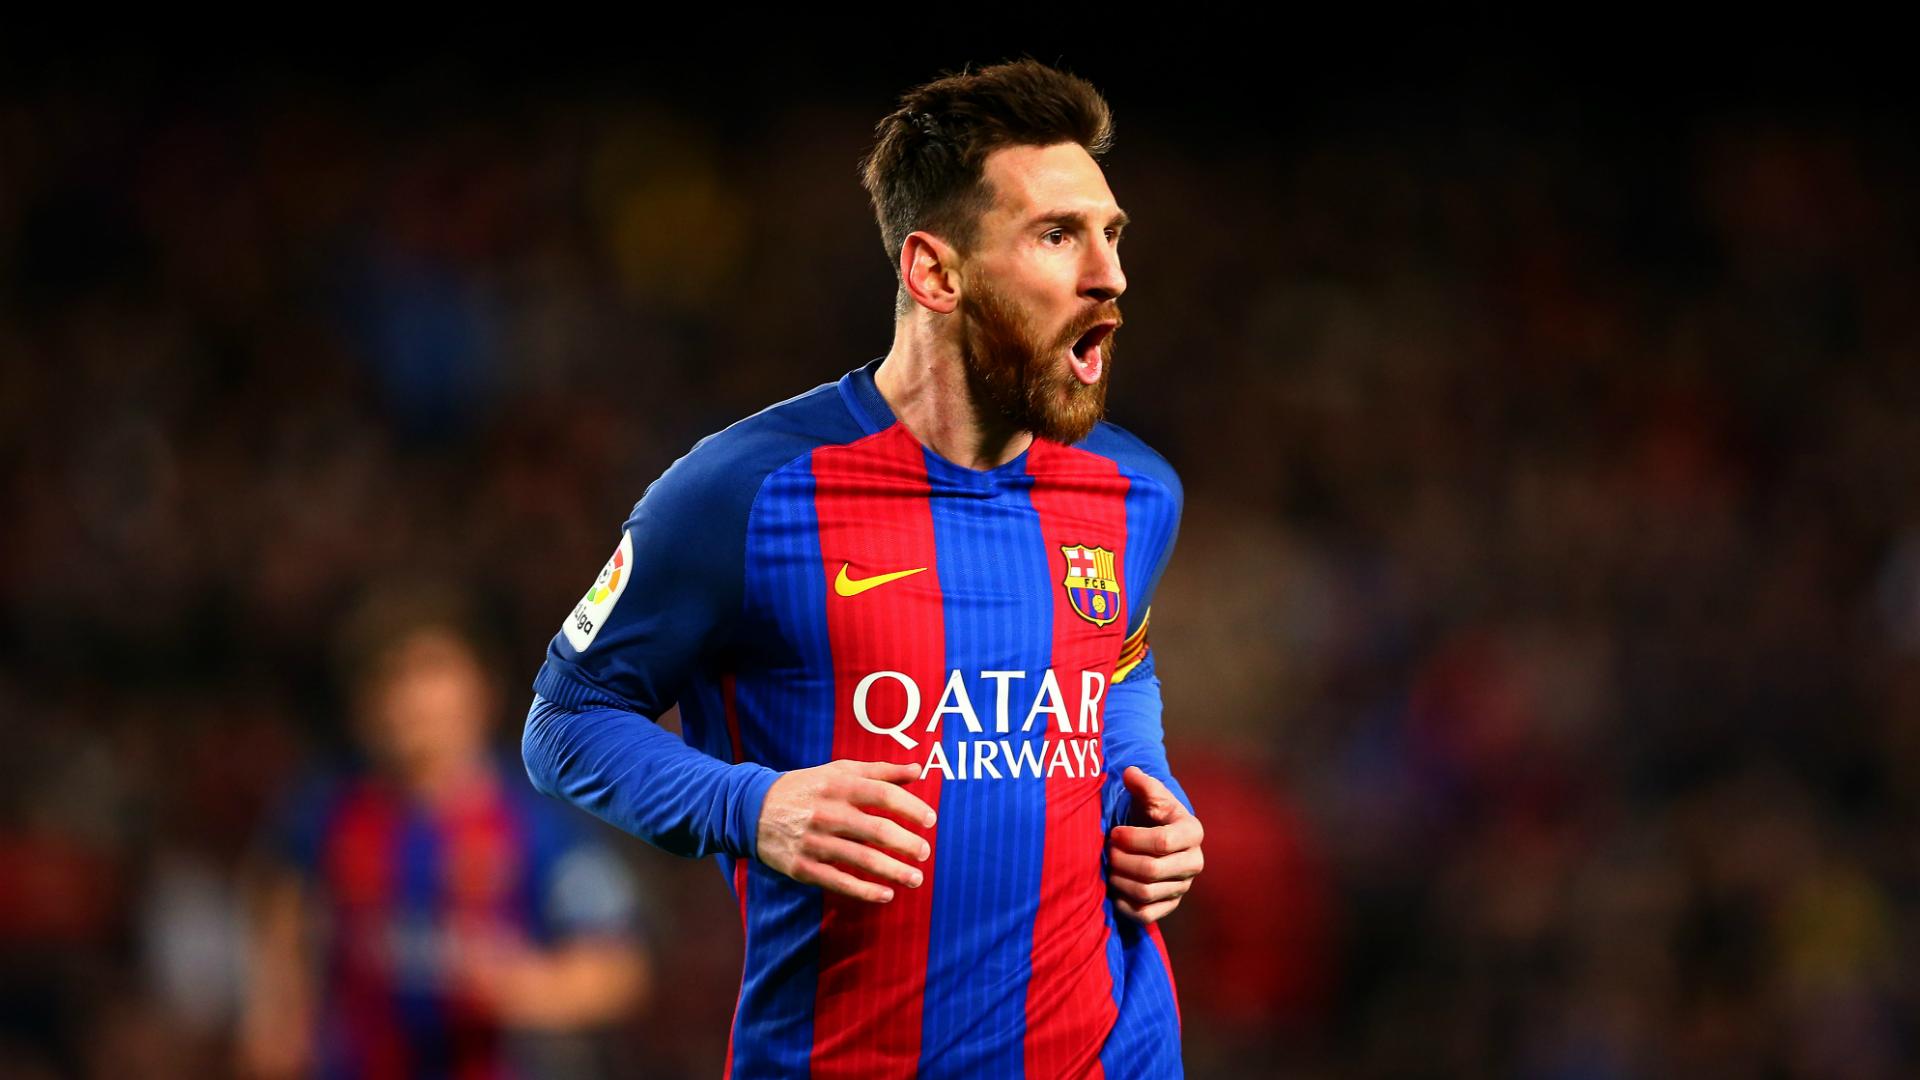 Messi Or Ronaldo - Barcelona Vs Psg 2017 , HD Wallpaper & Backgrounds